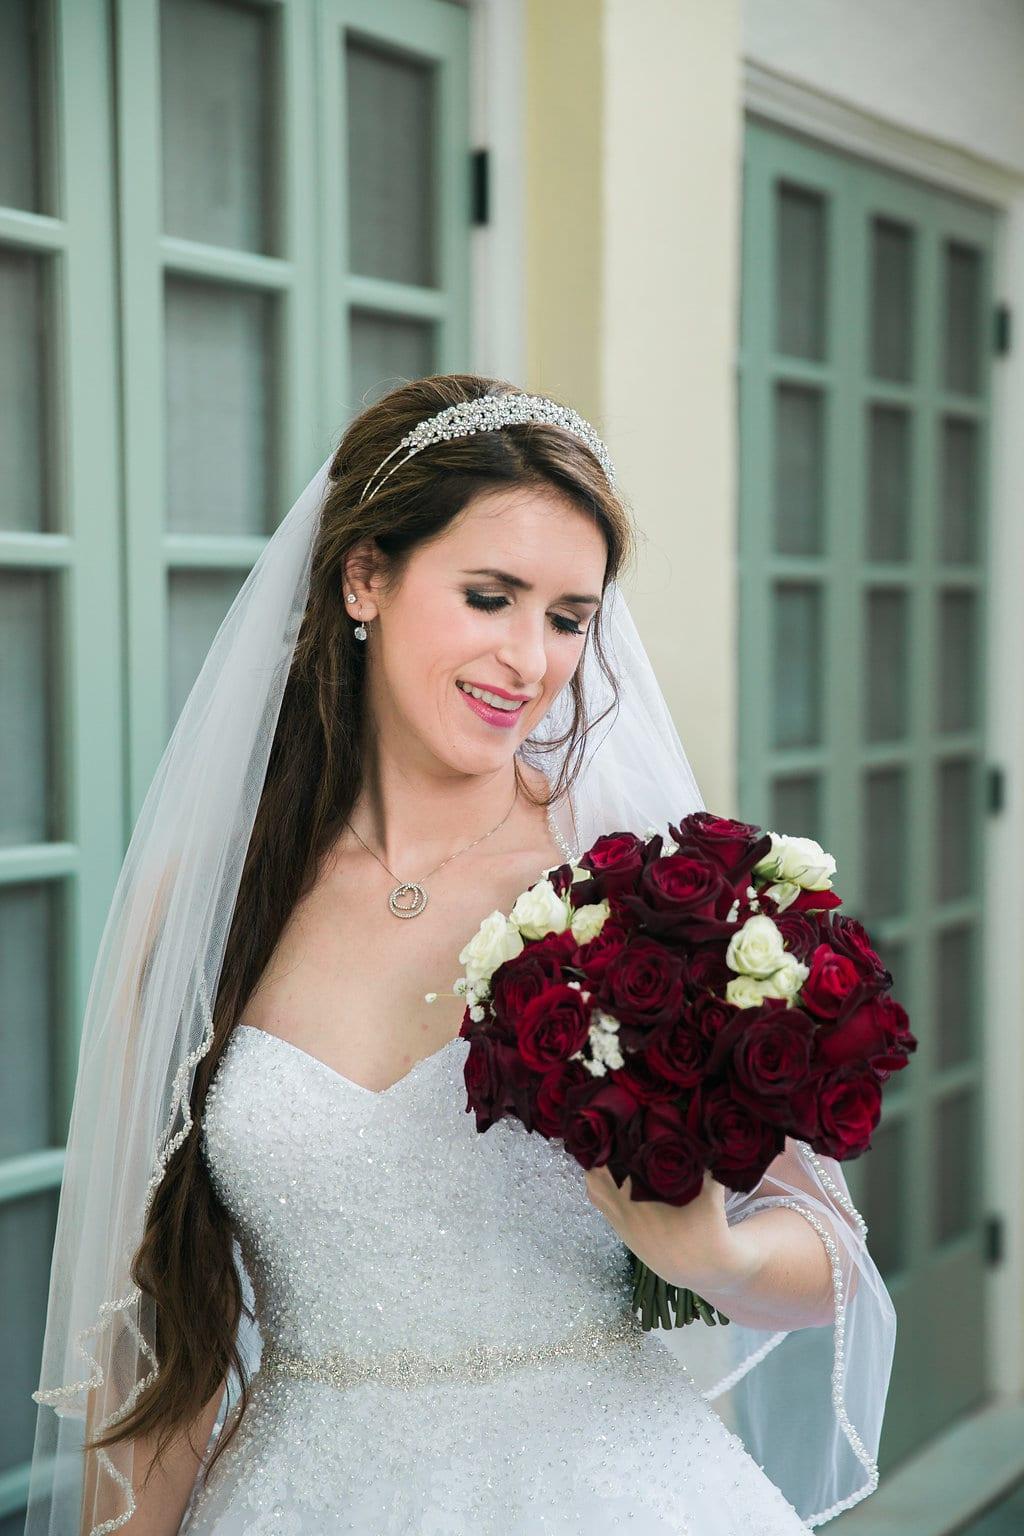 Laura's bridal at Landa Library window headshot looking at flowers